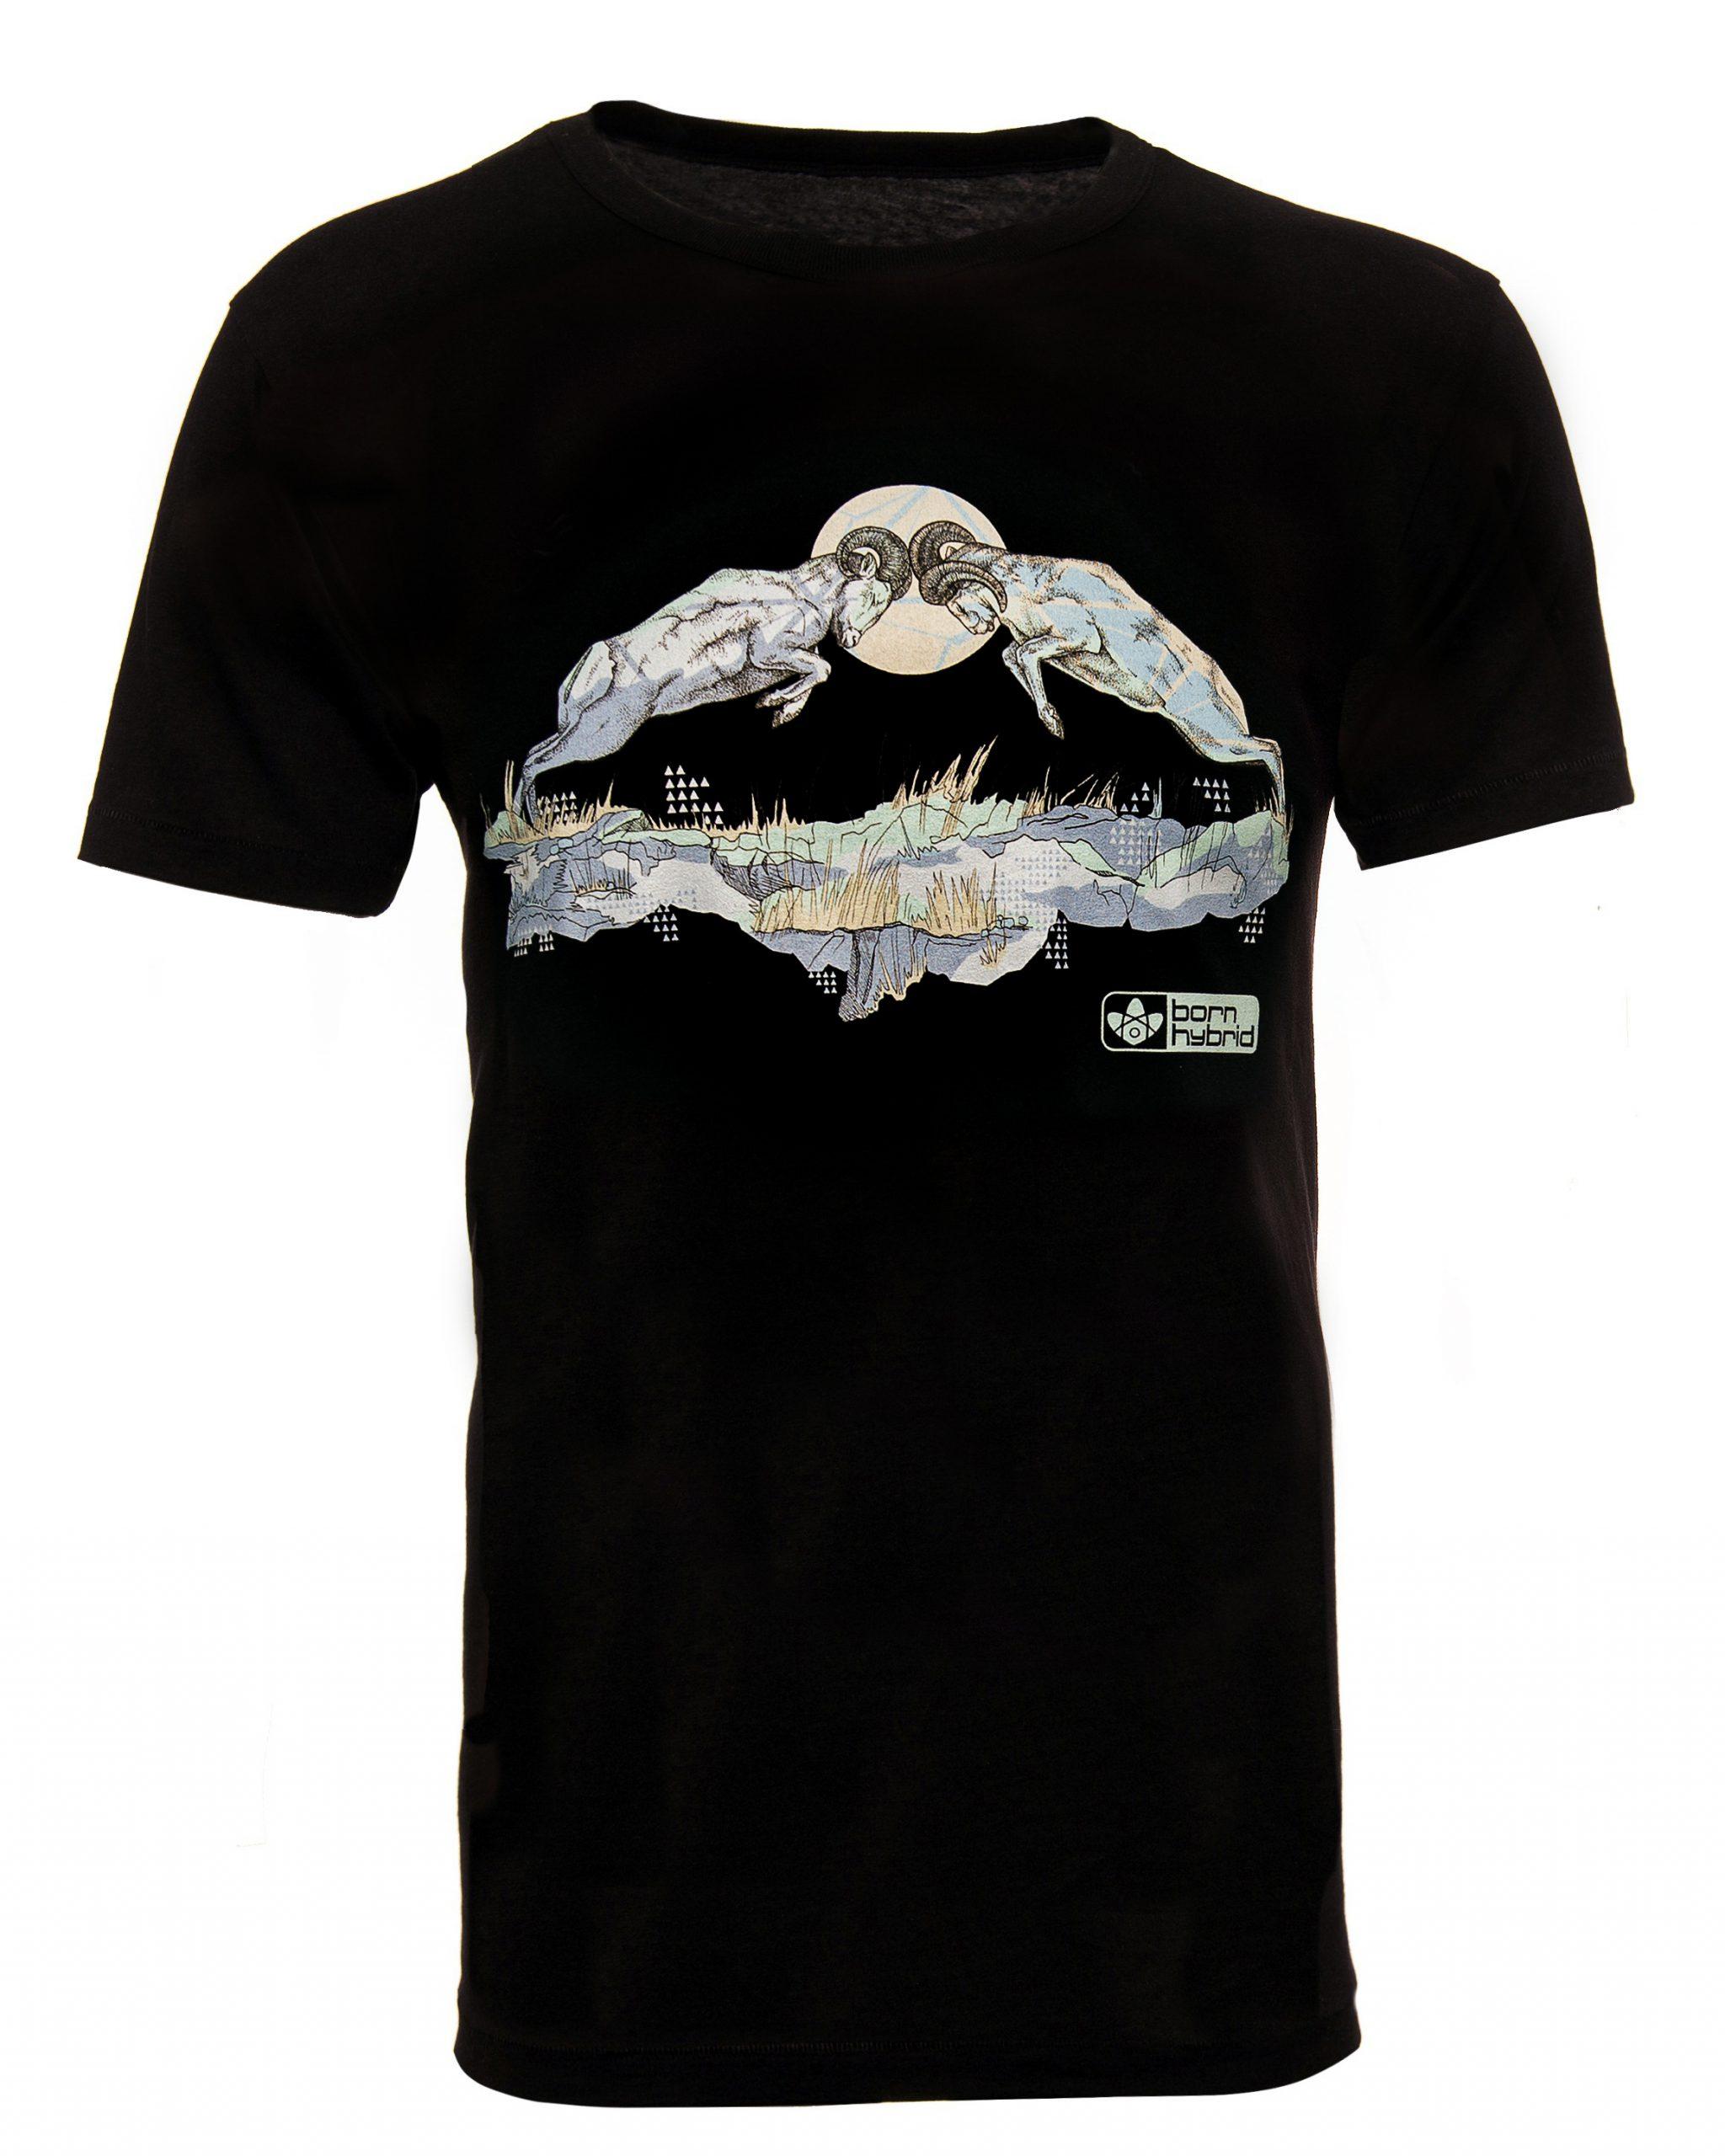 Black graphic T-shirt. Bighorn sheep t-shirt featuring two rams rutting. Eco T-shirt in organic combed cotton